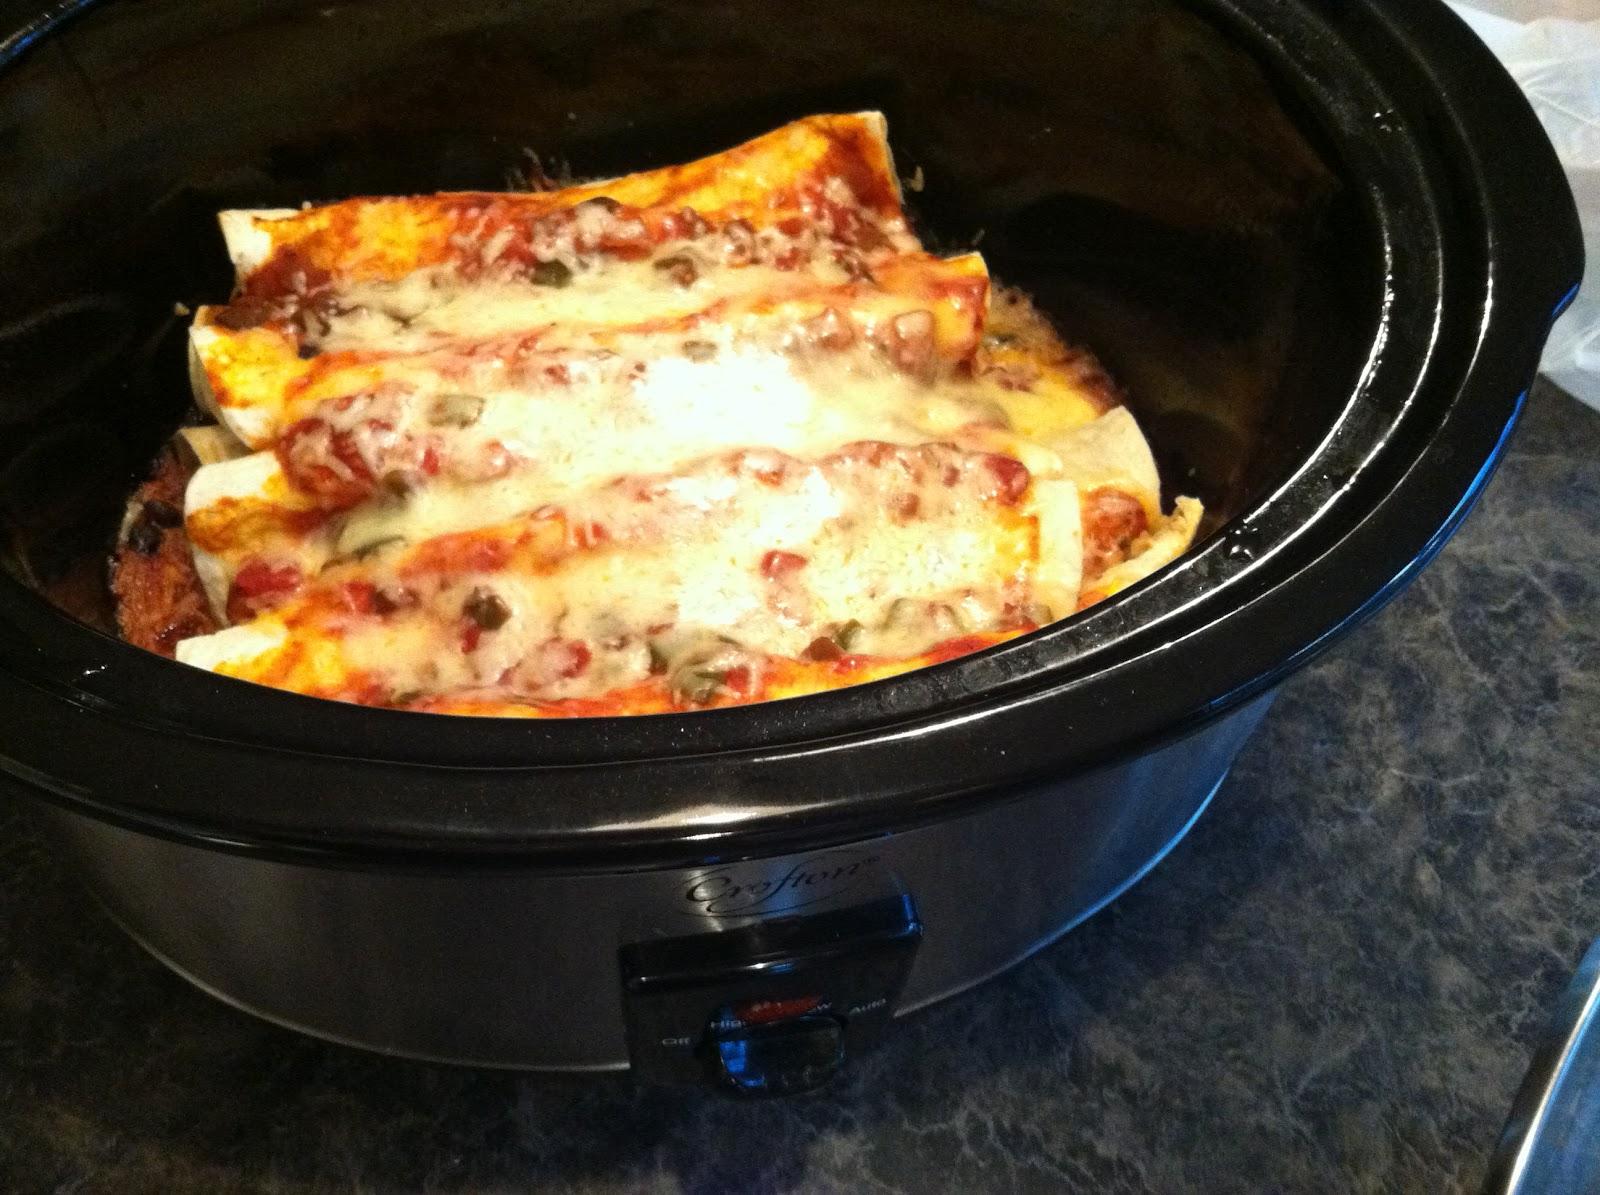 Creative Me Glutenfree Crock Pot Vegetarian Enchiladas